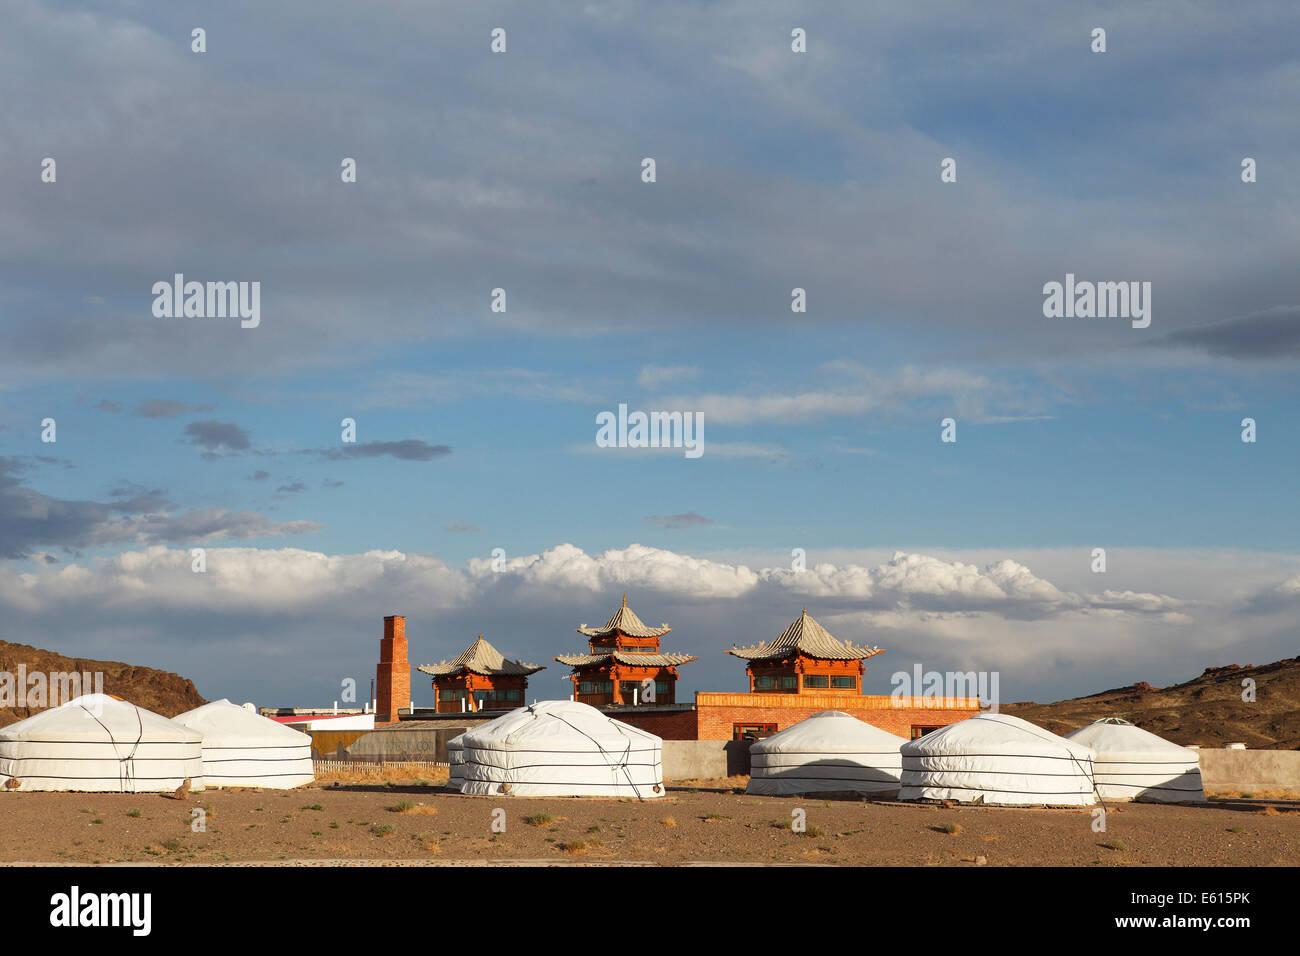 Yurt camp at the Ongi Khiid Monastery, Ongi river valley, Central Desert, Dundgovi Province, Mongolia - Stock Image